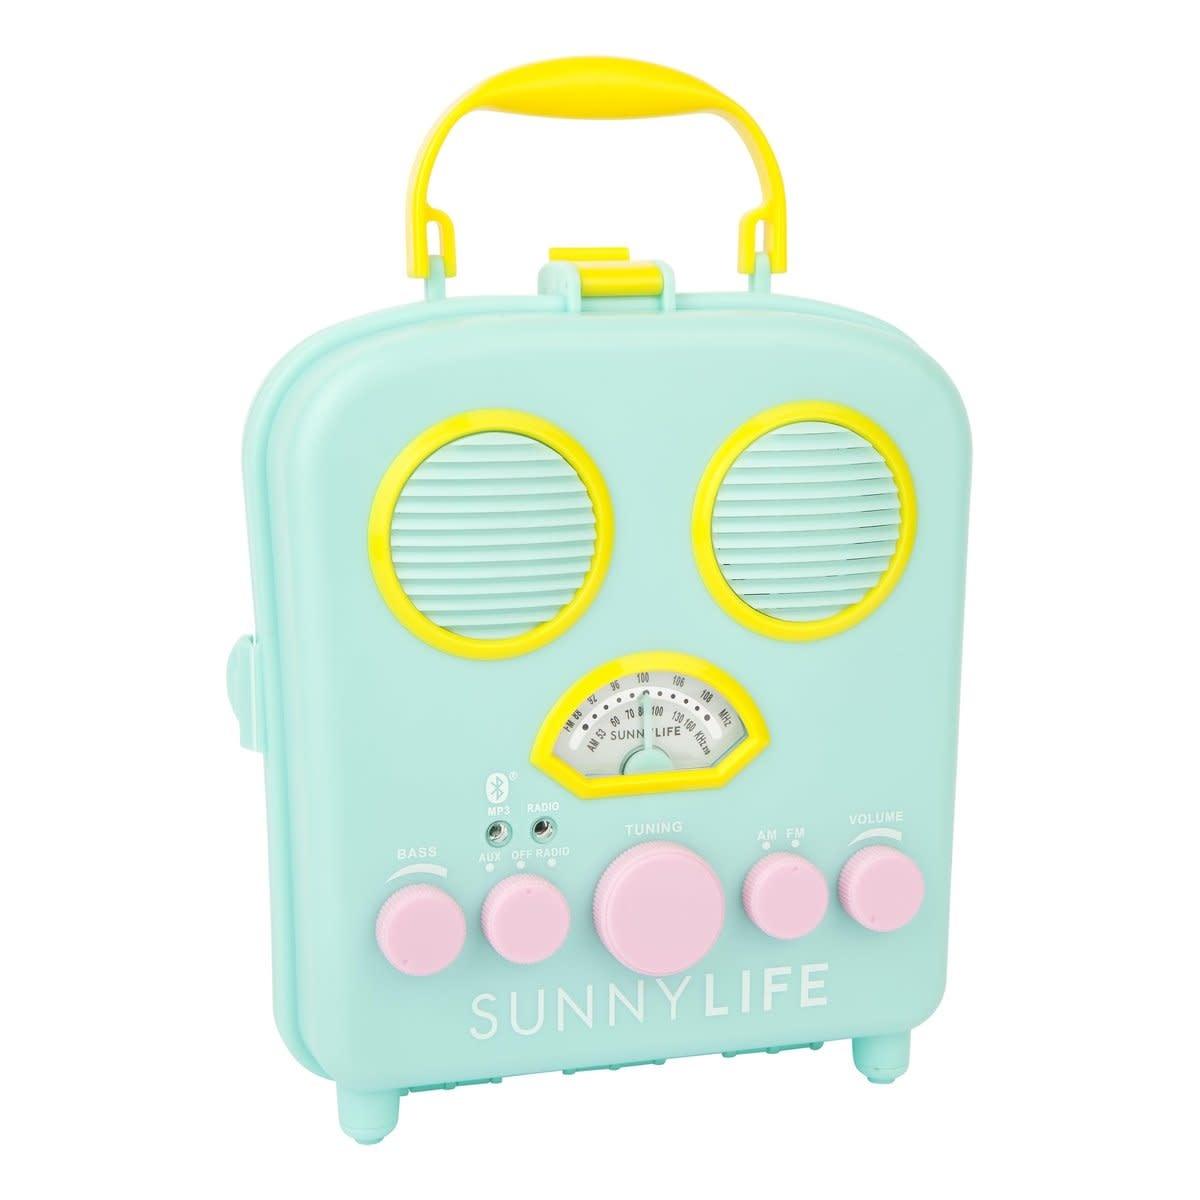 Sunnylife SUN GI - Seafoam Beach Sounds Radio